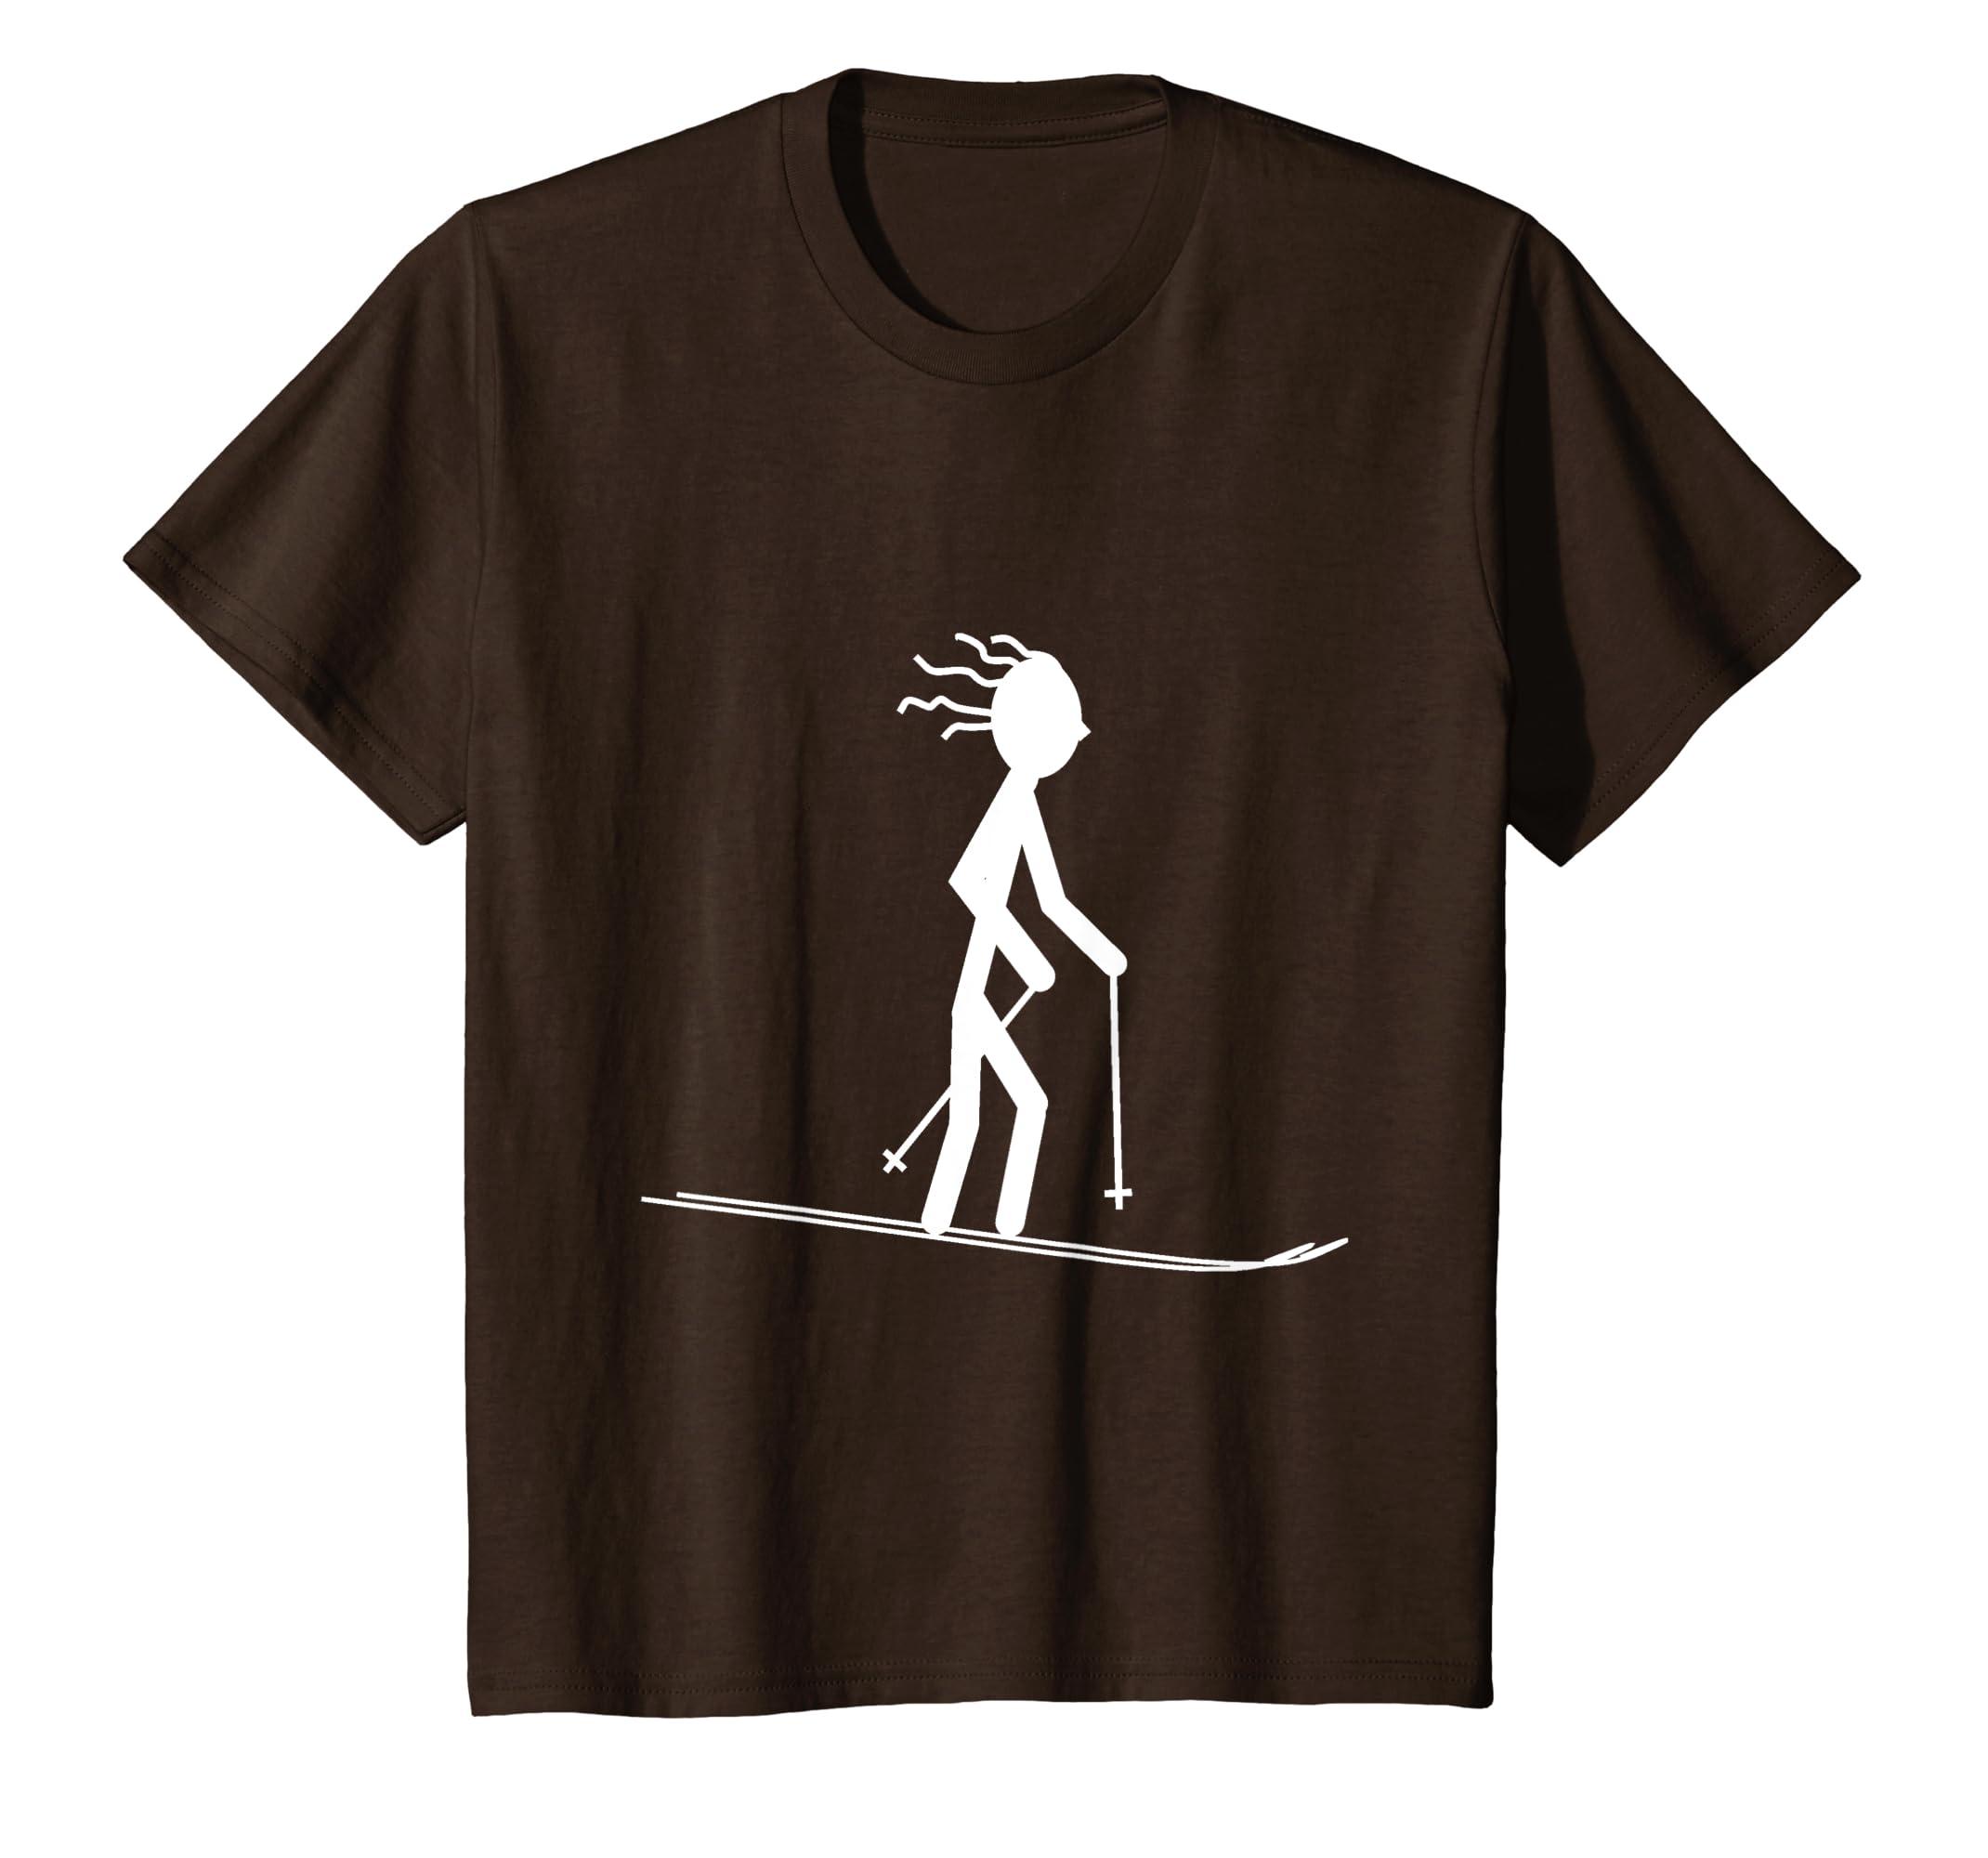 96984ae499 Amazon.com: Funny Ski Shirts   Skiing Shirts   Snow Ski T Shirt: Clothing